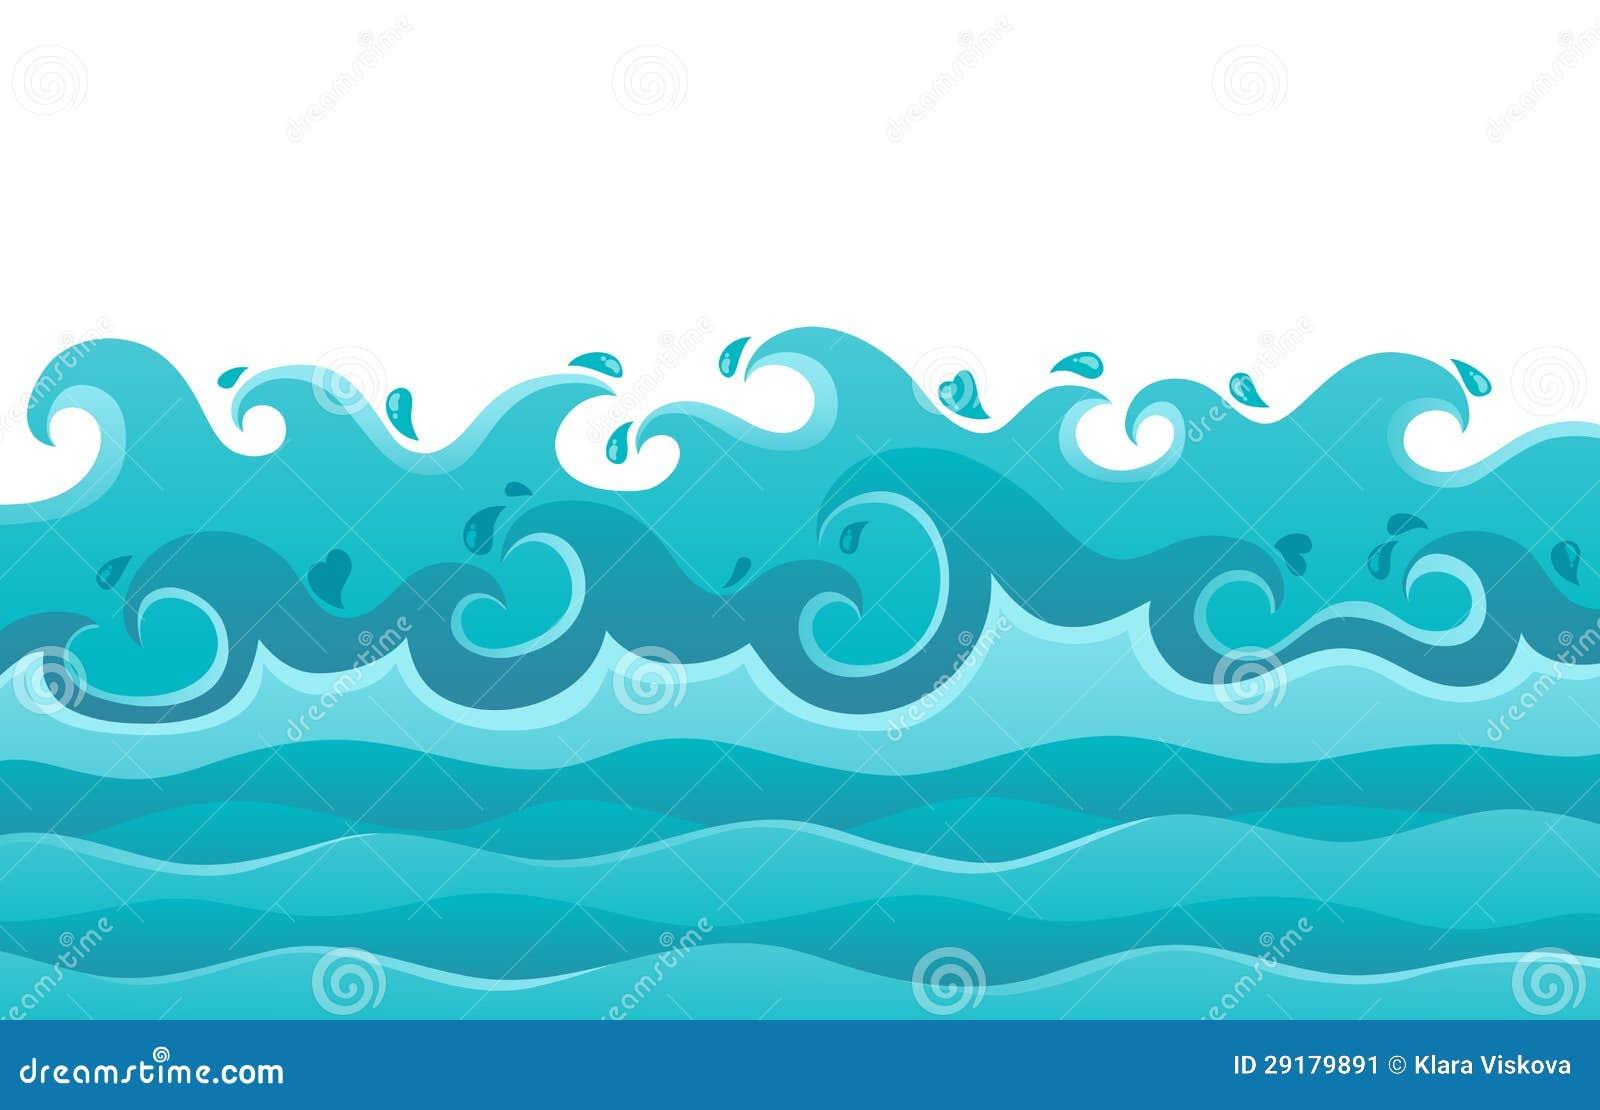 Waves theme image